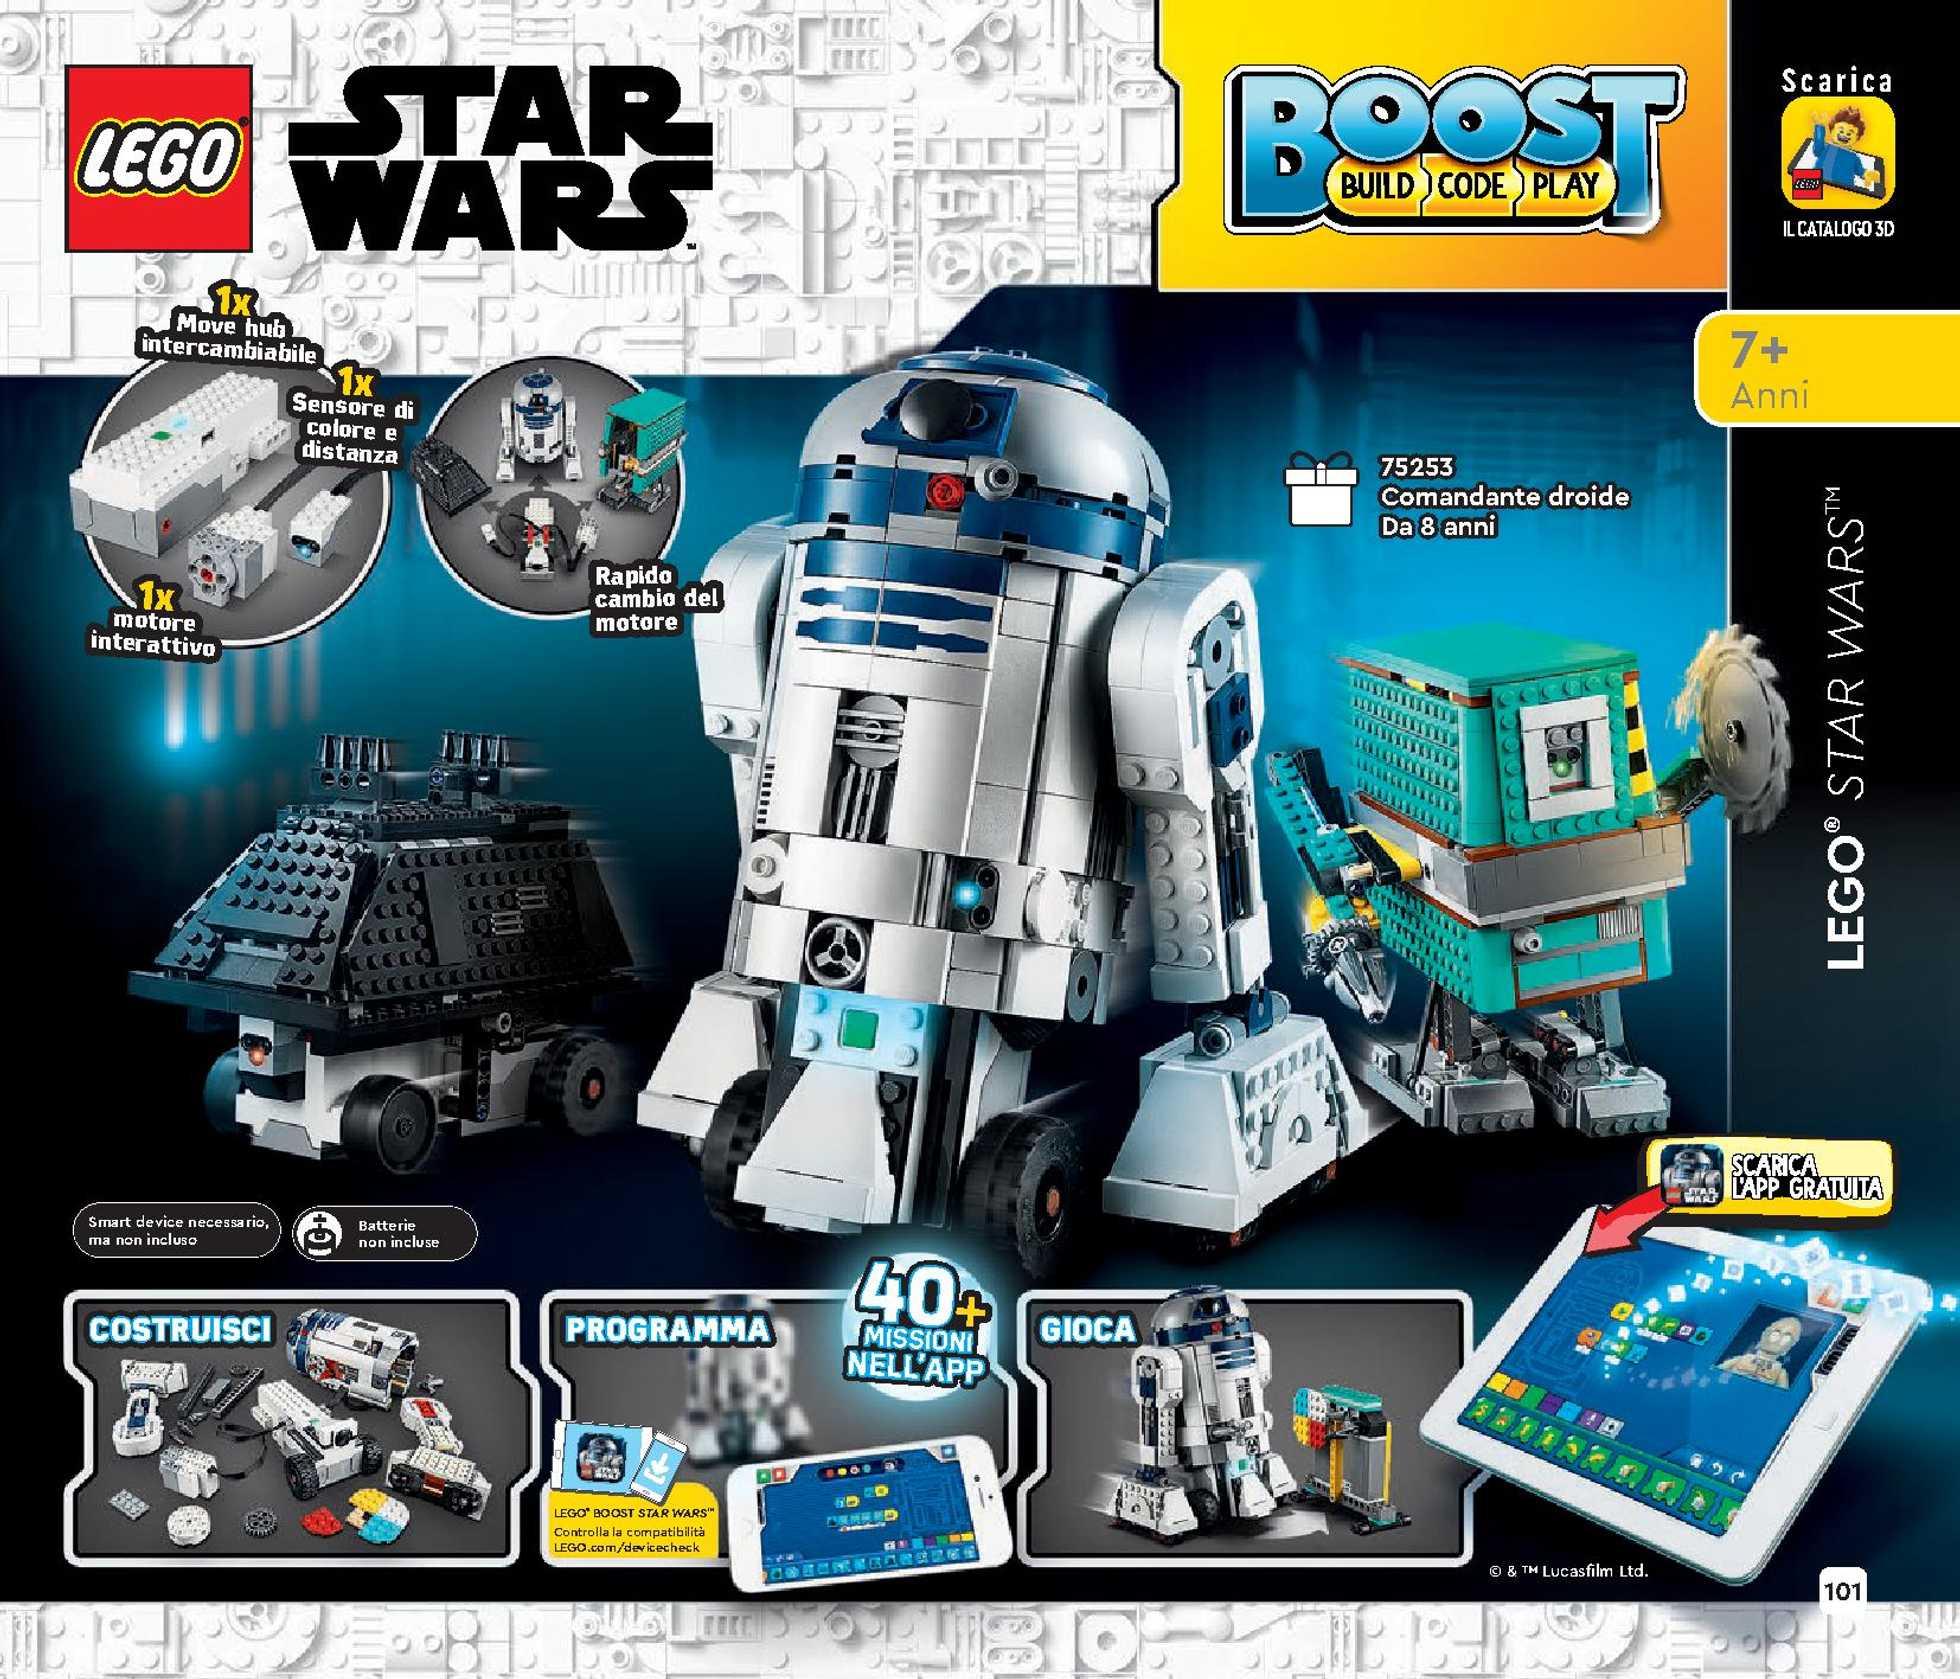 Lego - offerte valide dal 01.07.2020 al 31.12.2020 - pagina 4.